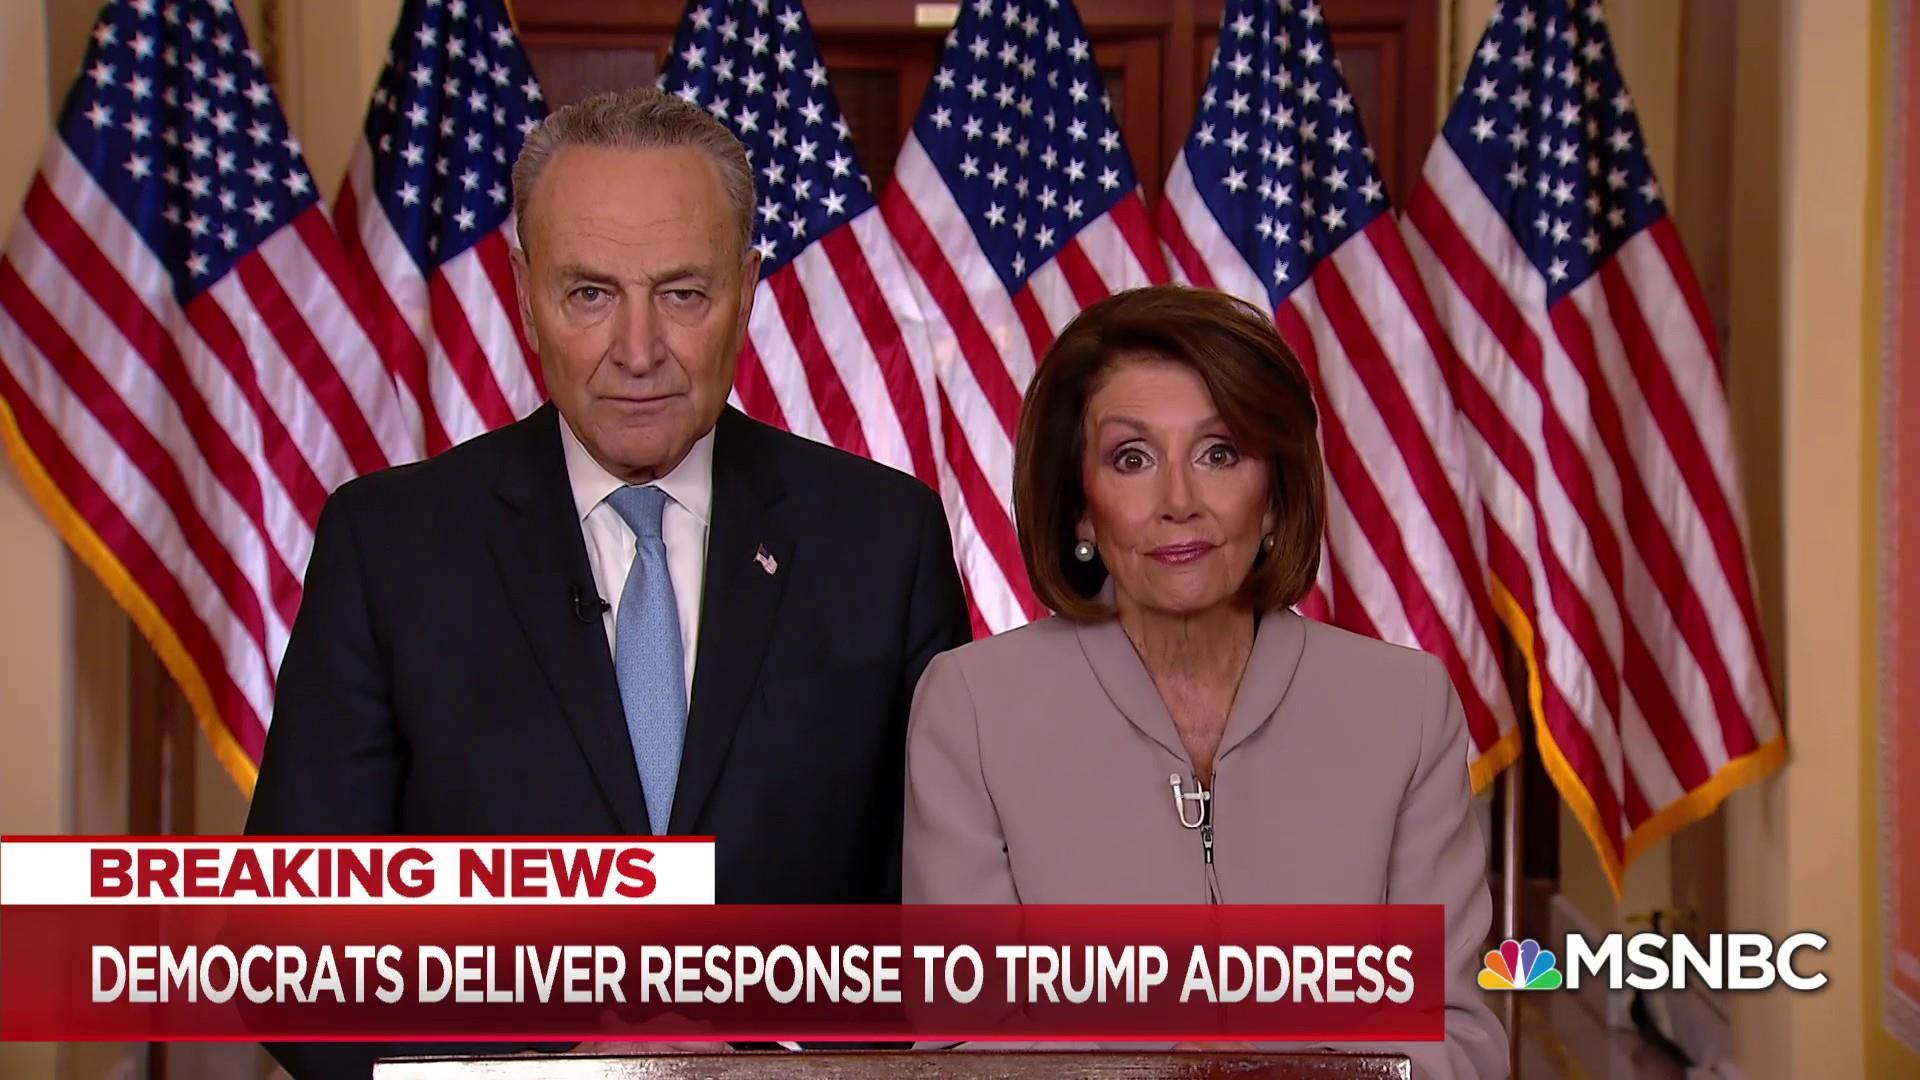 Democratic response: Trump throughout shutdown has misinformed